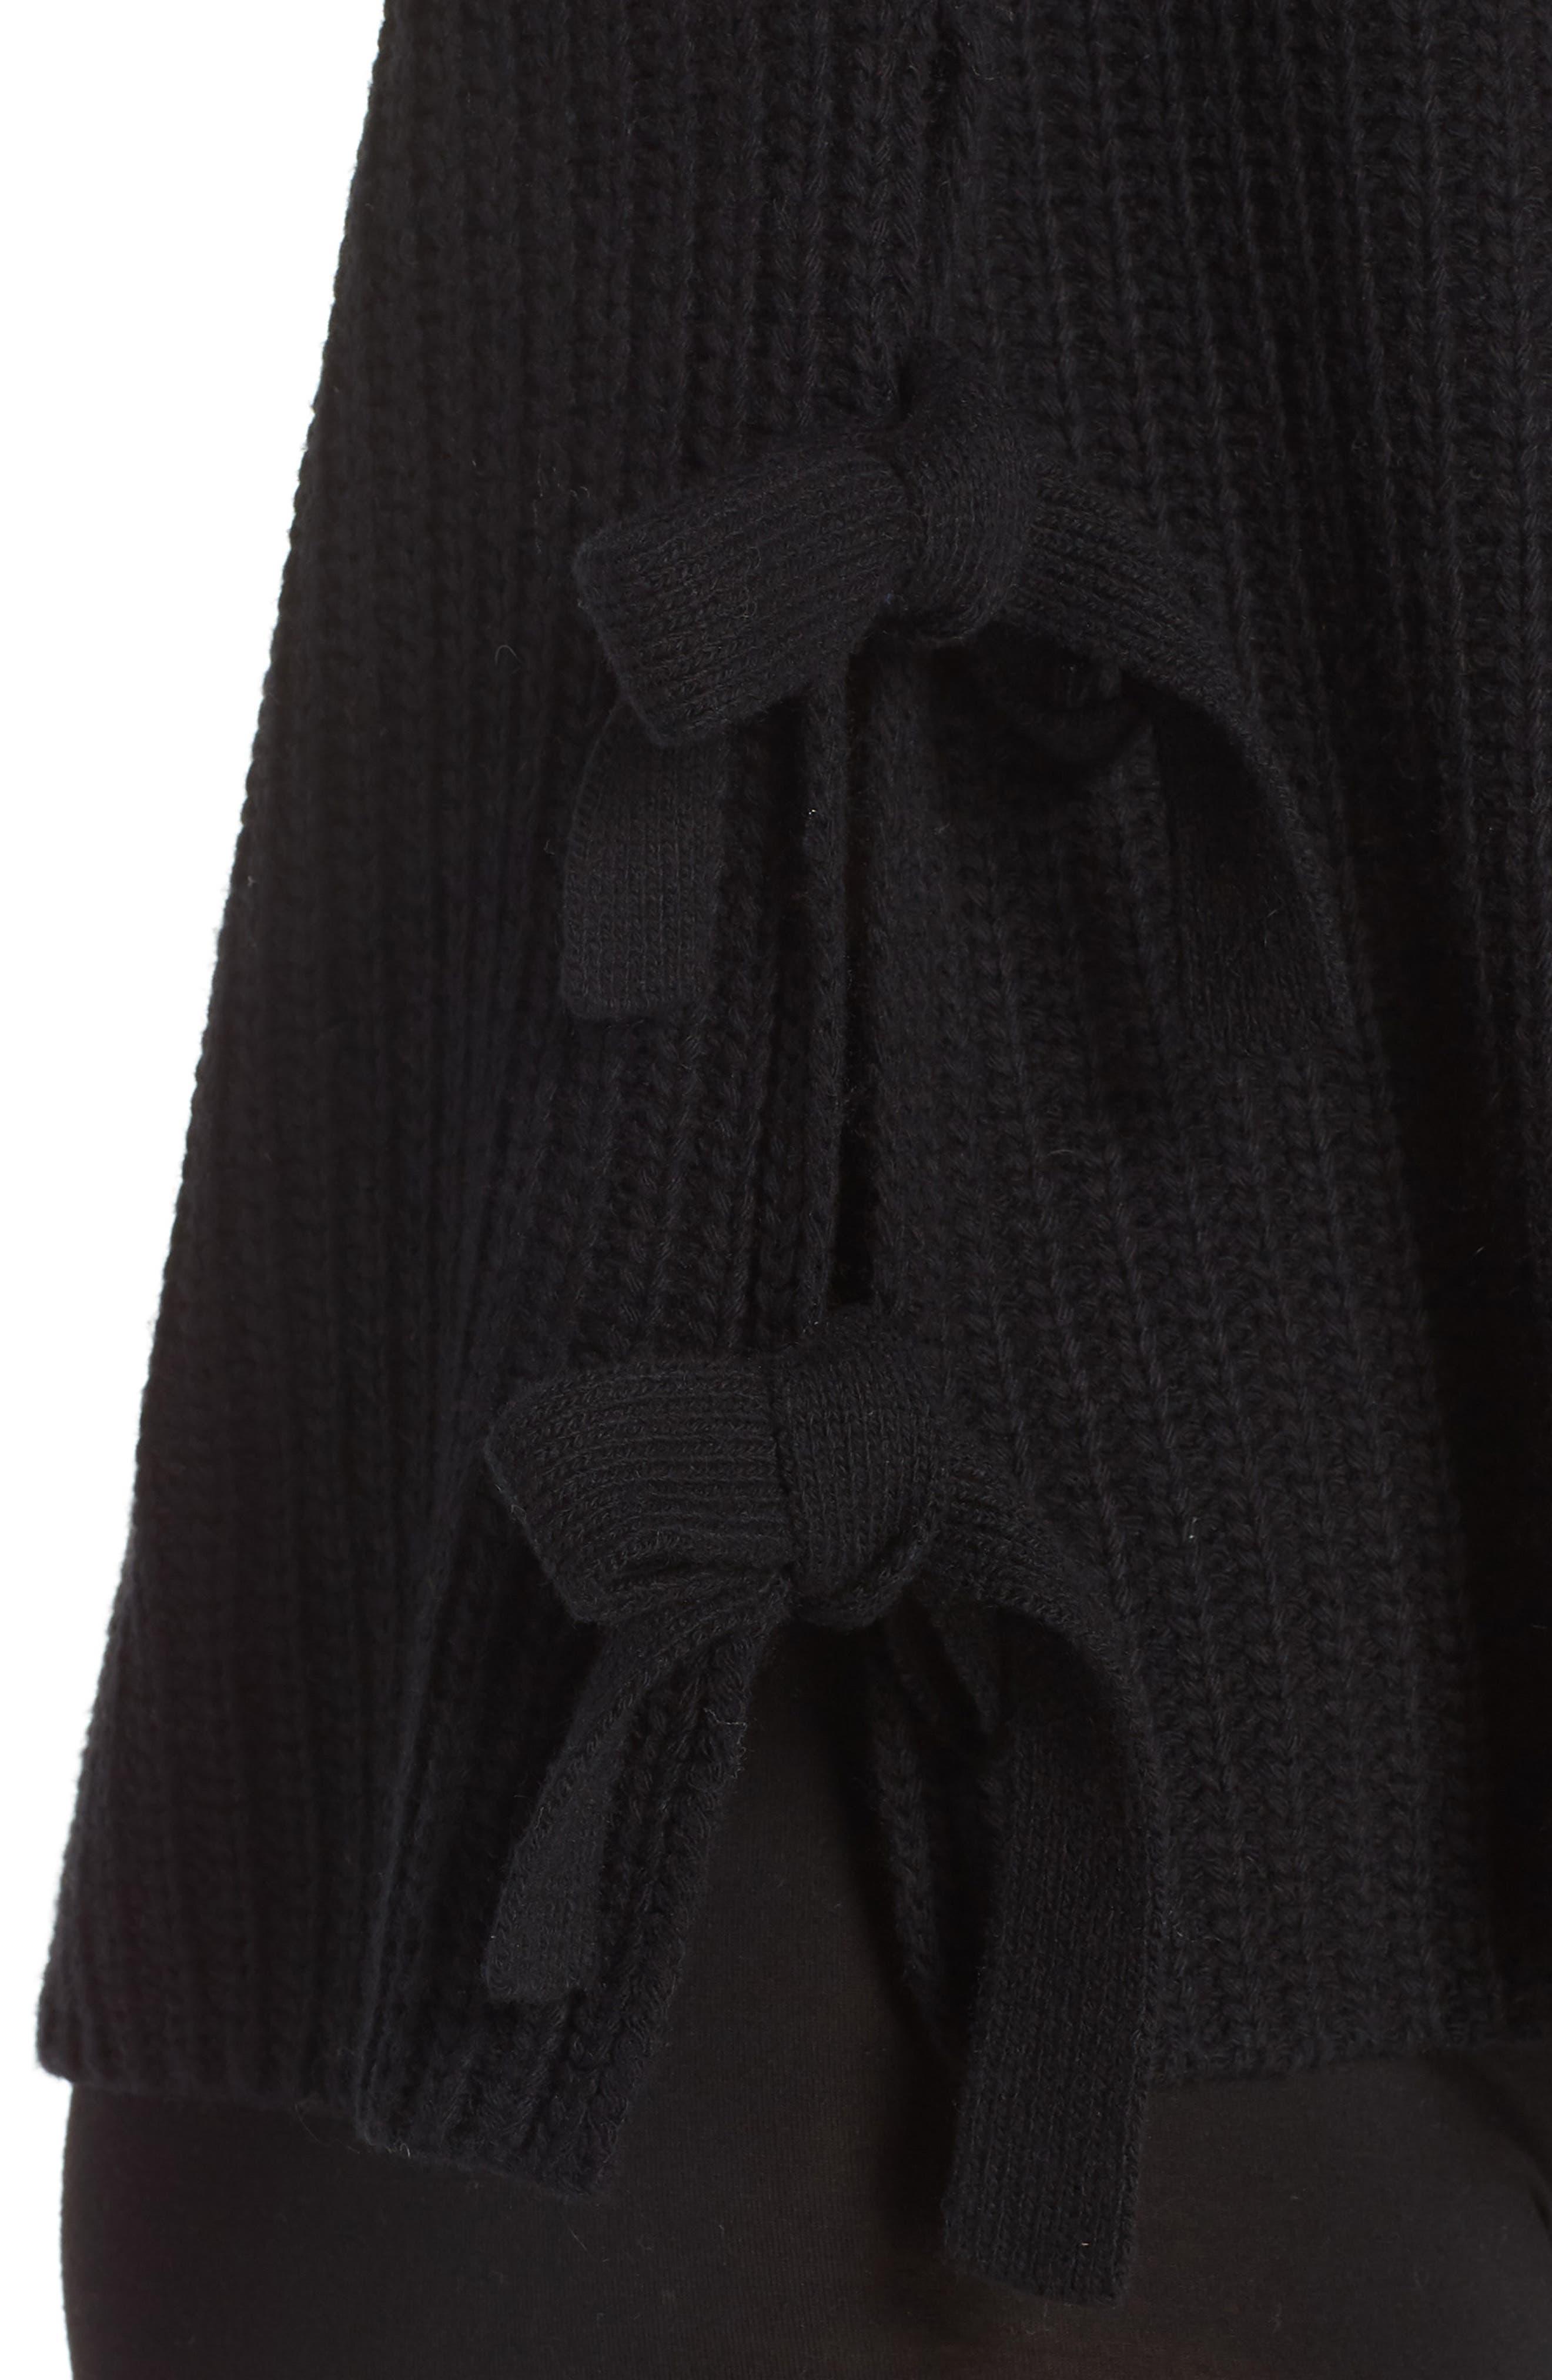 Ceanne Turtleneck Sweater,                             Alternate thumbnail 4, color,                             001